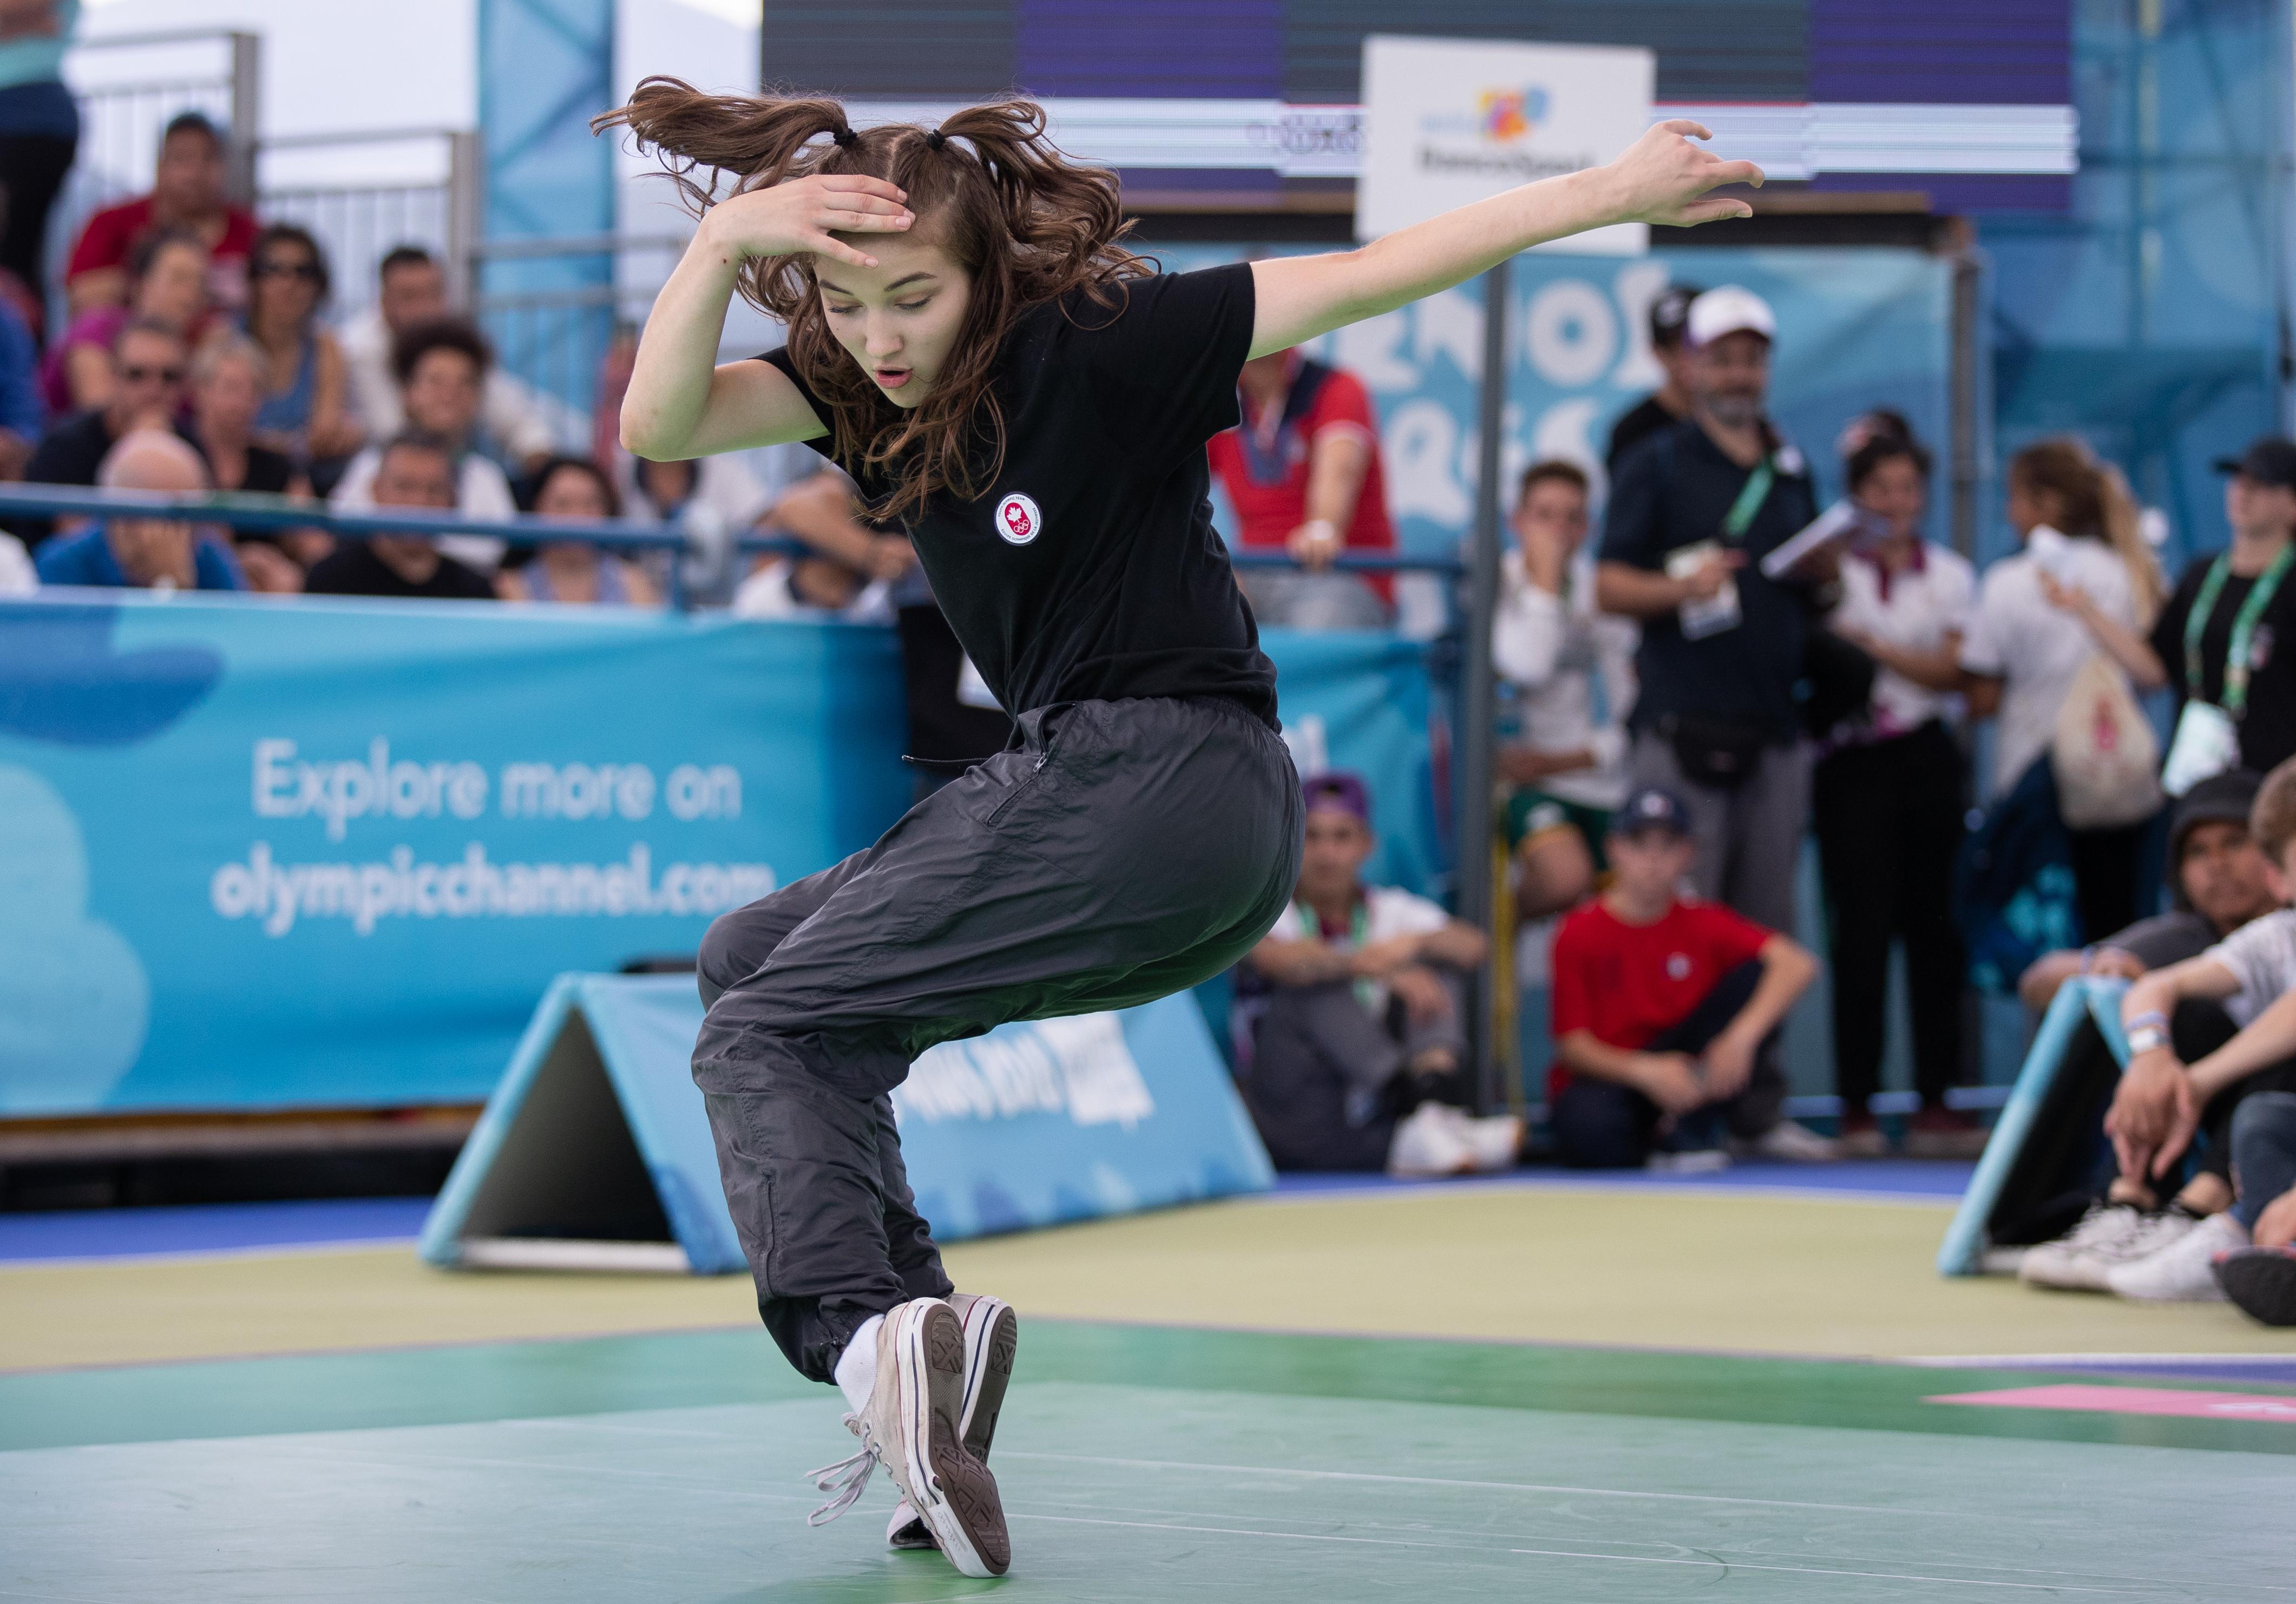 Break dancer competing